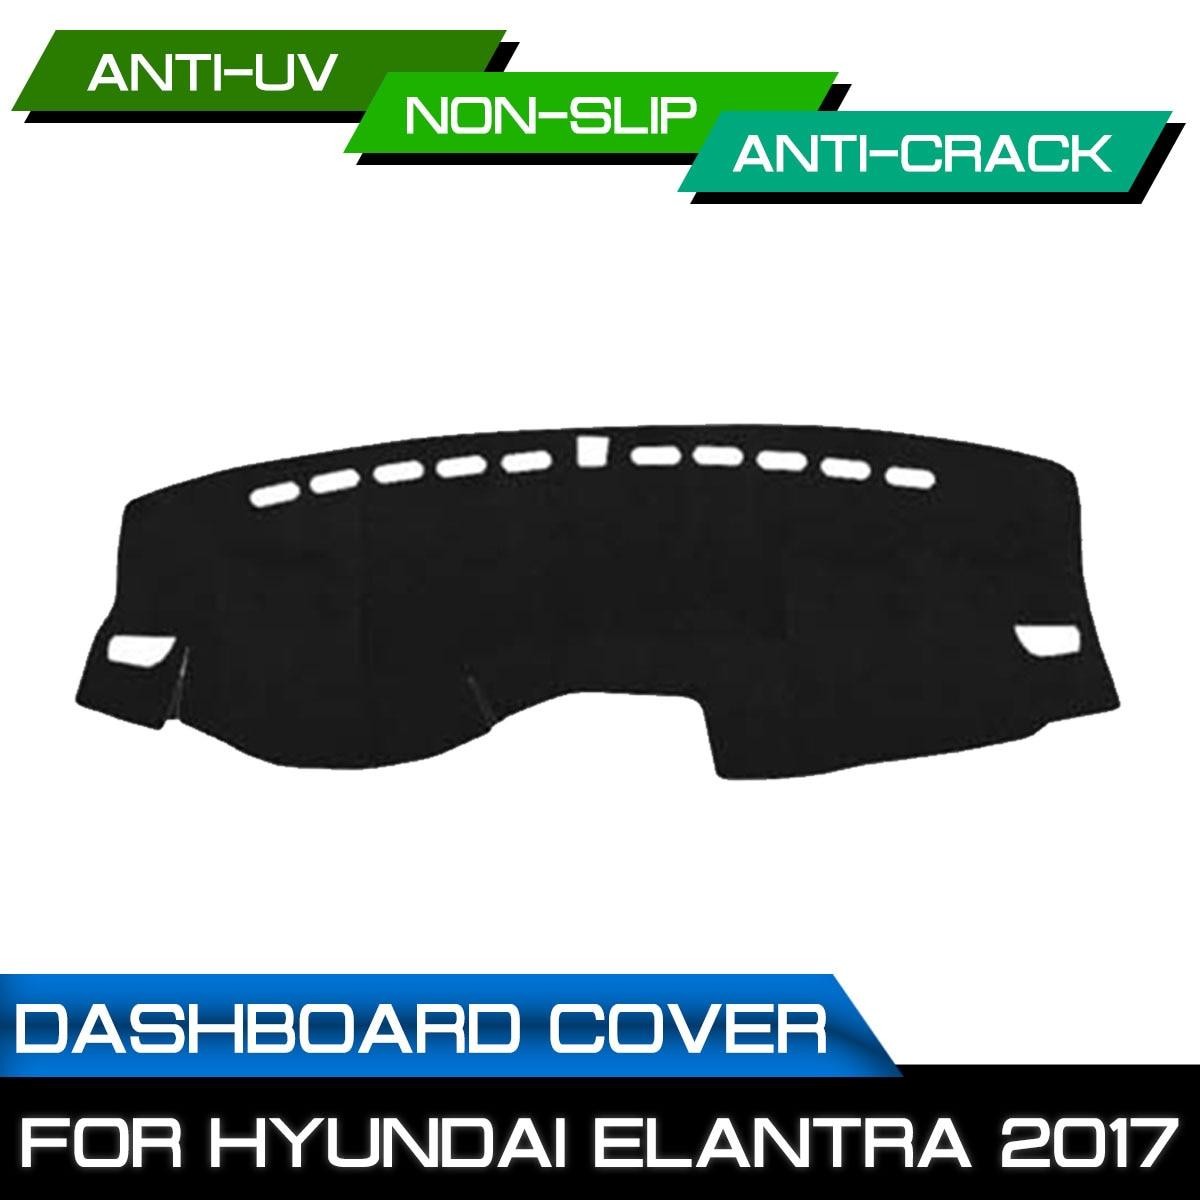 Car Dashboard Mat for Hyundai Elantra 2017 Anti-dirty Non-slip Dash Cover Mat UV Protection Shade